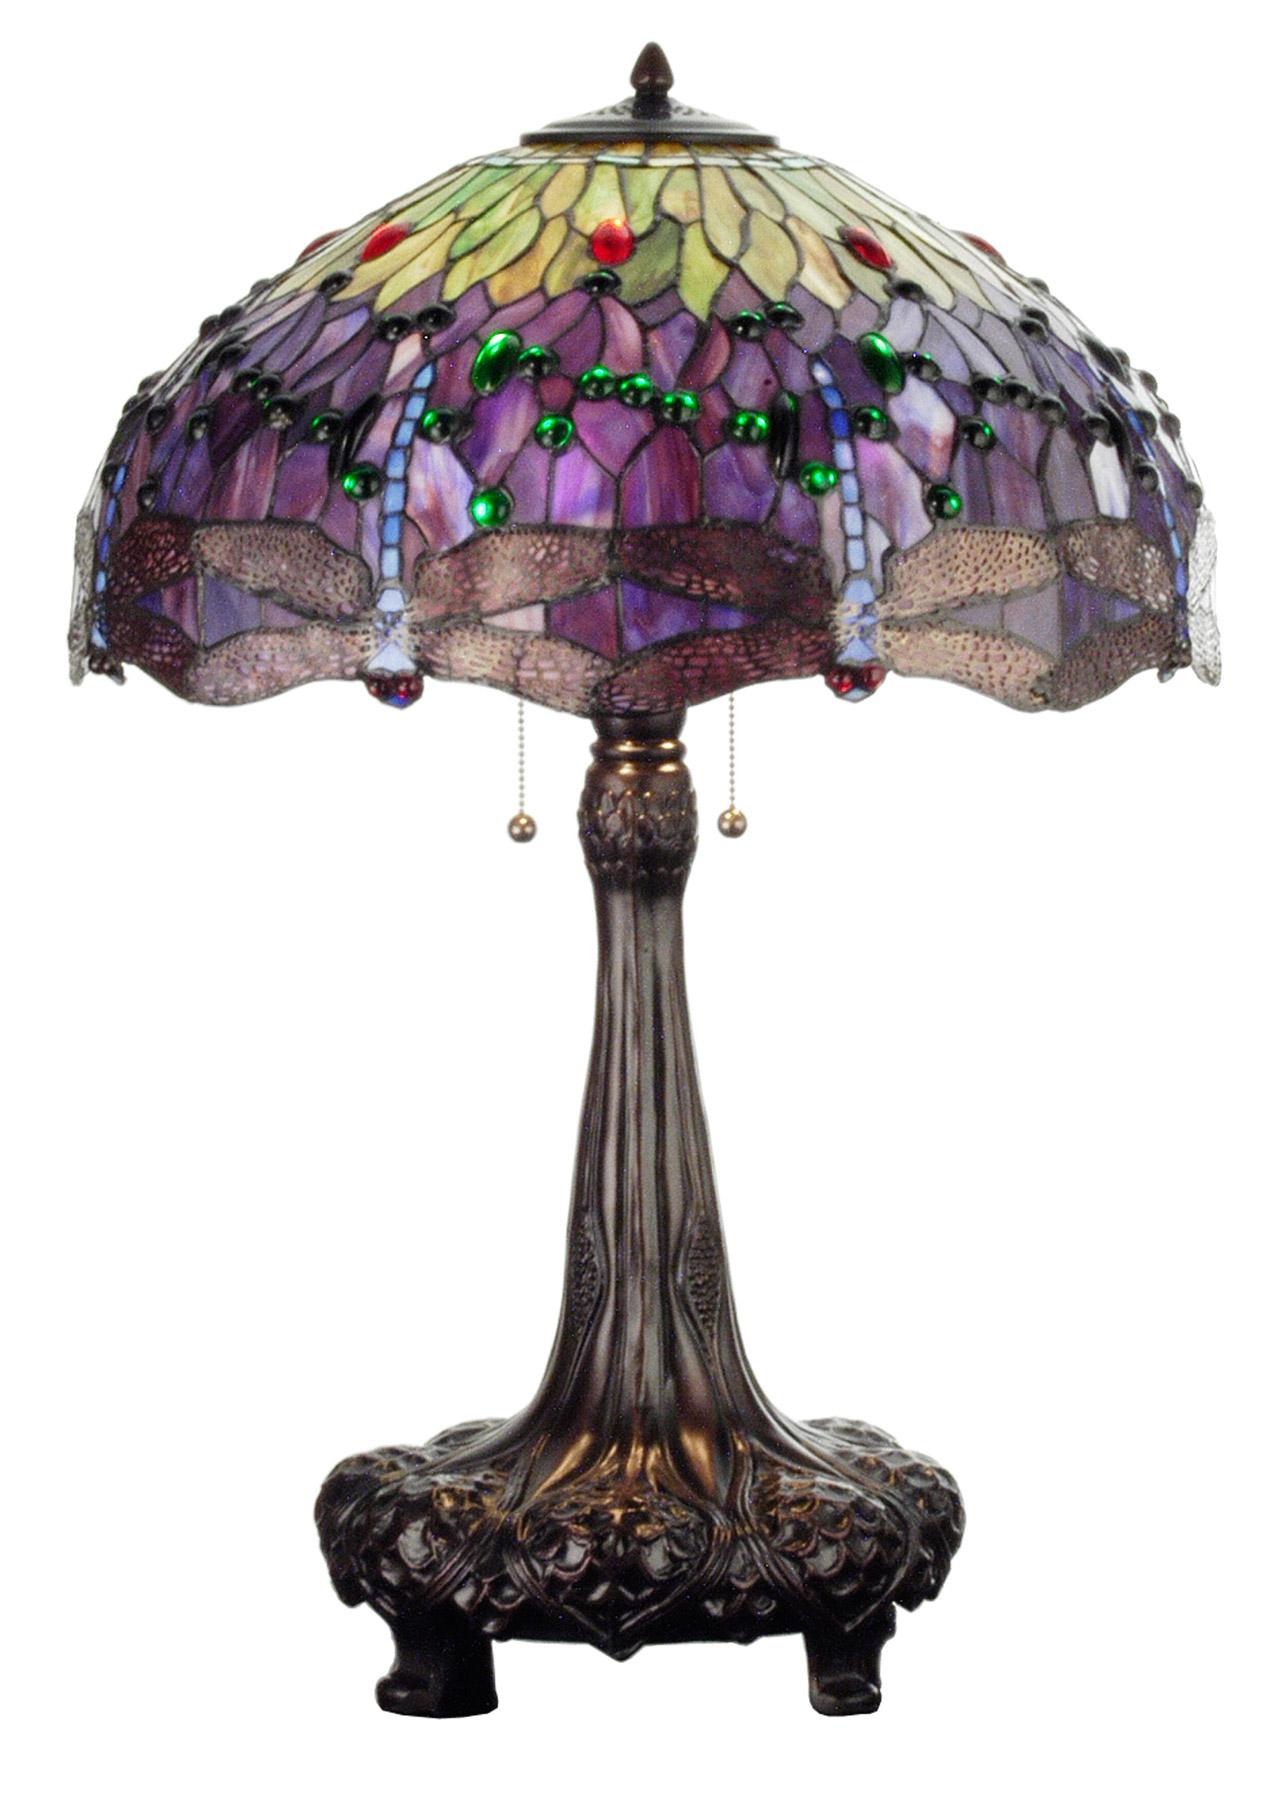 Meyda 31112 Tiffany Hanginghead Dragonfly Table Lamp